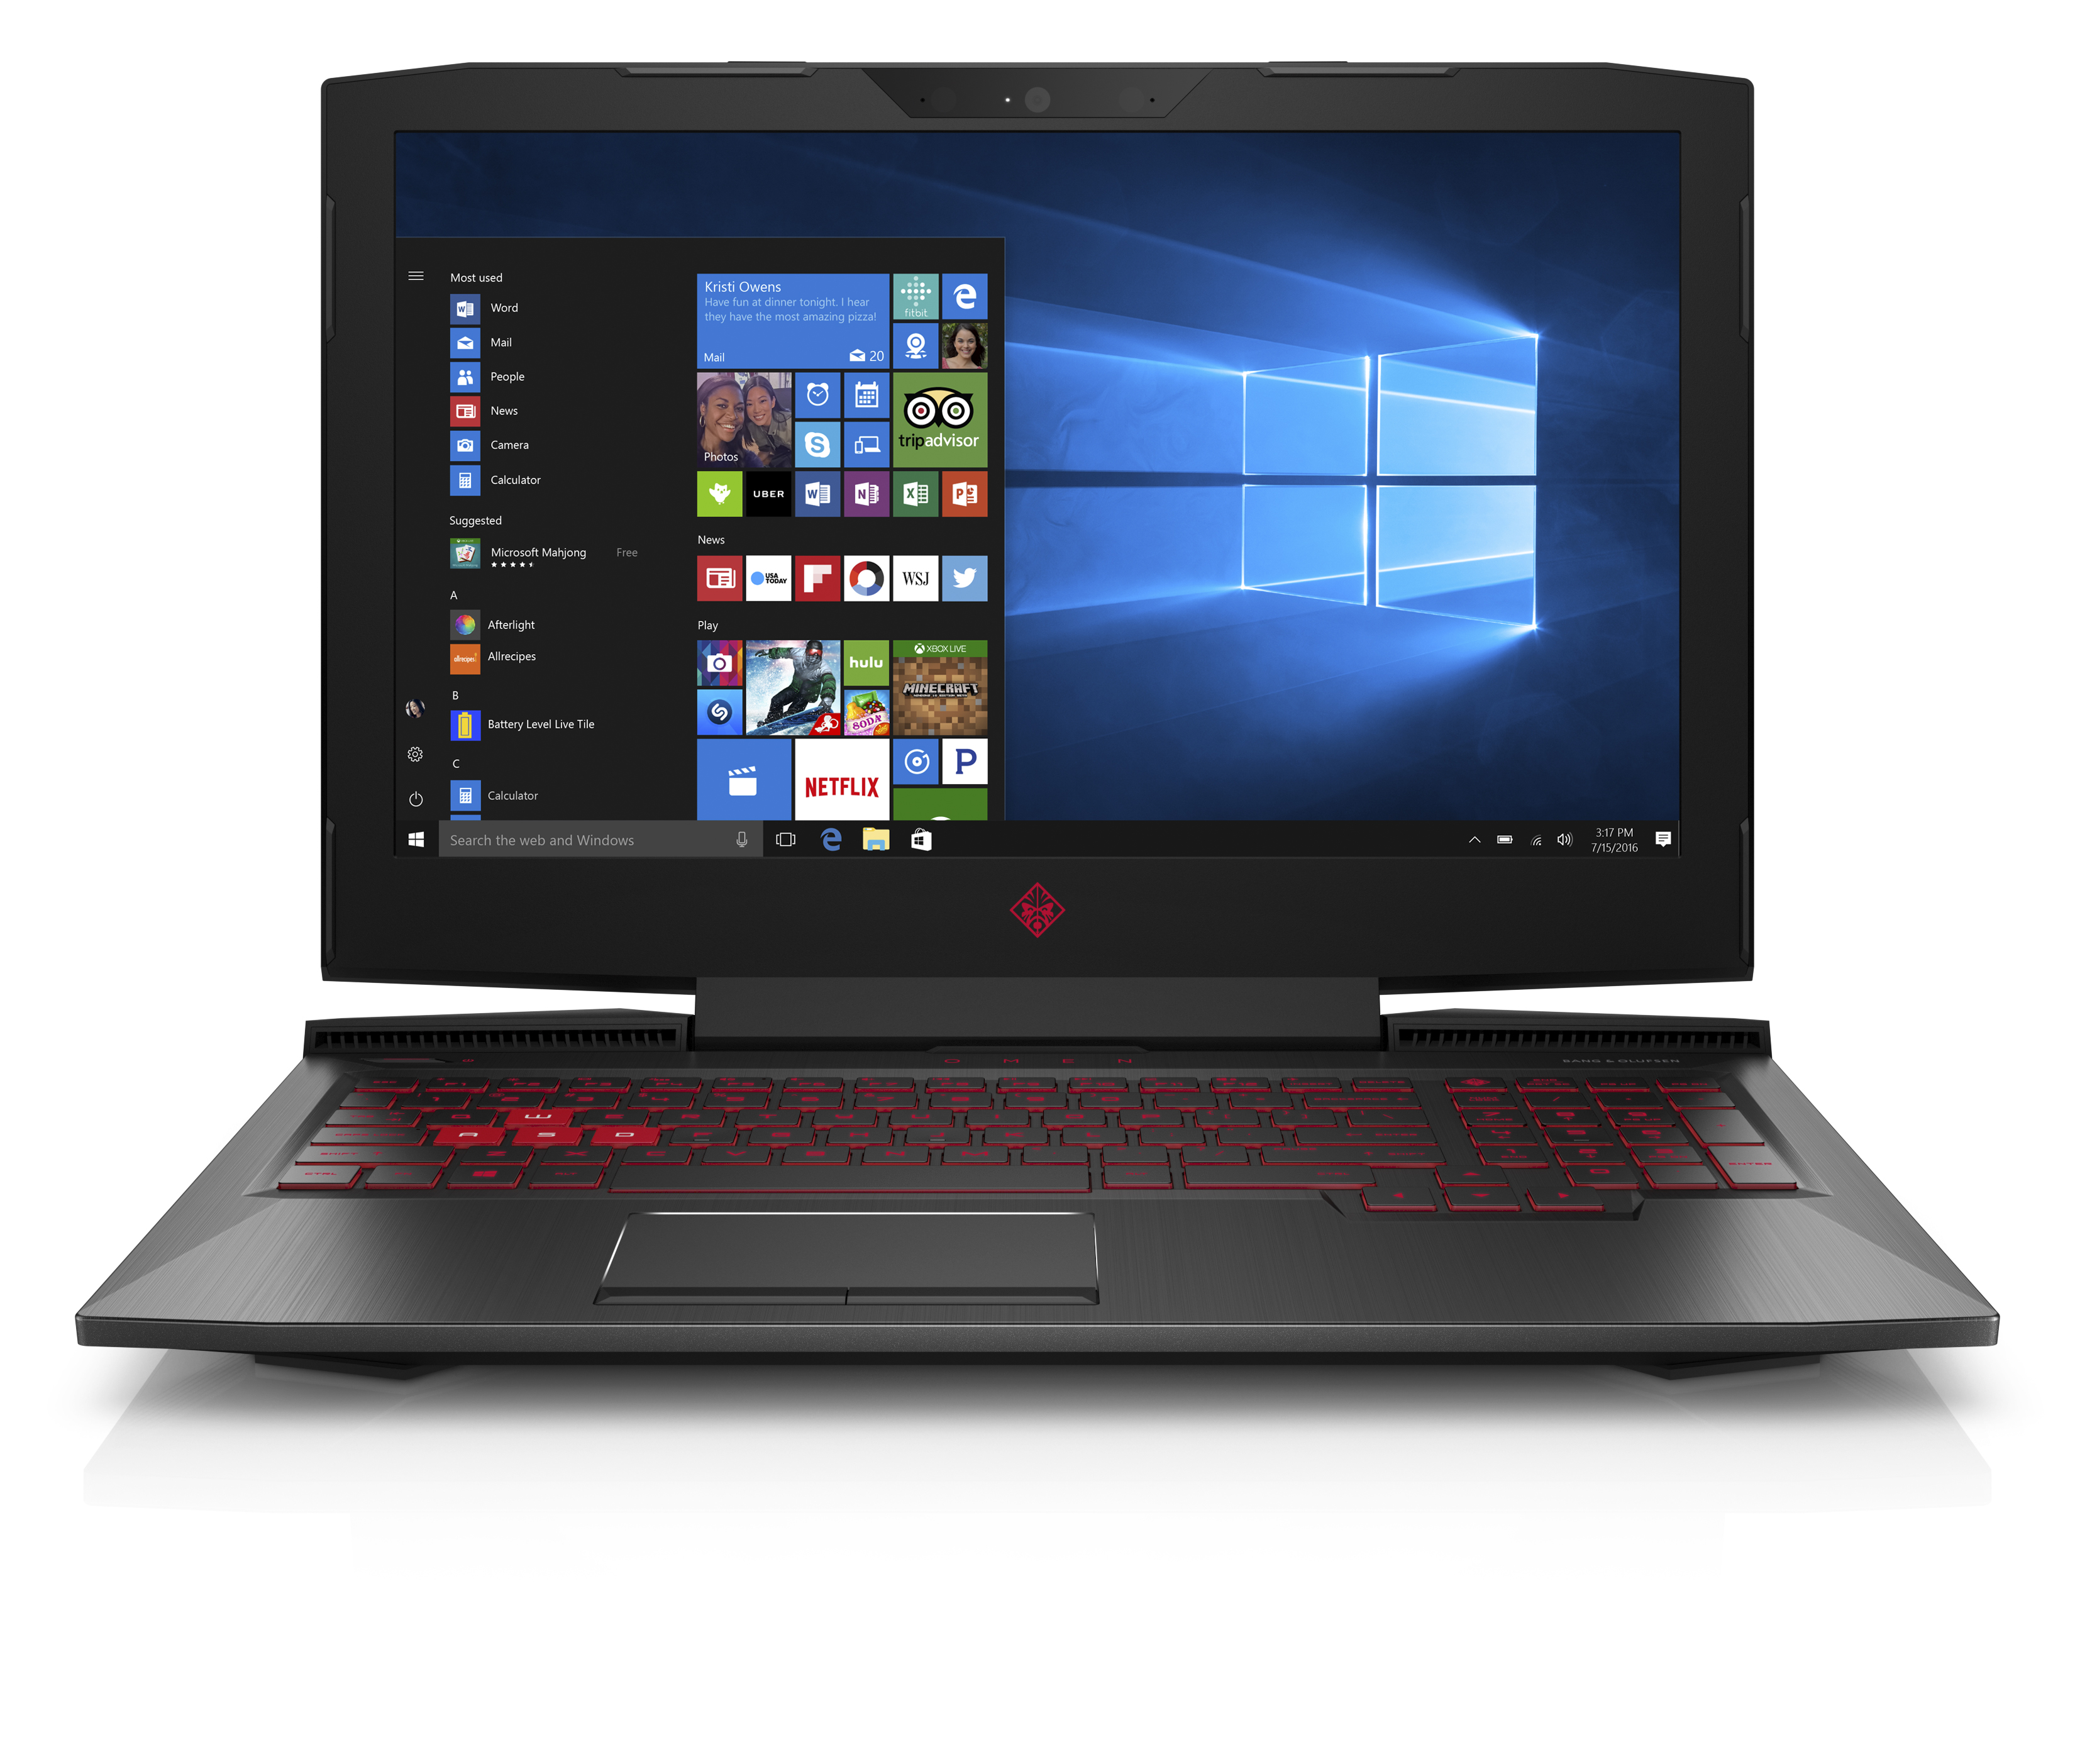 HP Updates Their OMEN Gaming Lineup: Desktops, Notebooks, eGFX, and